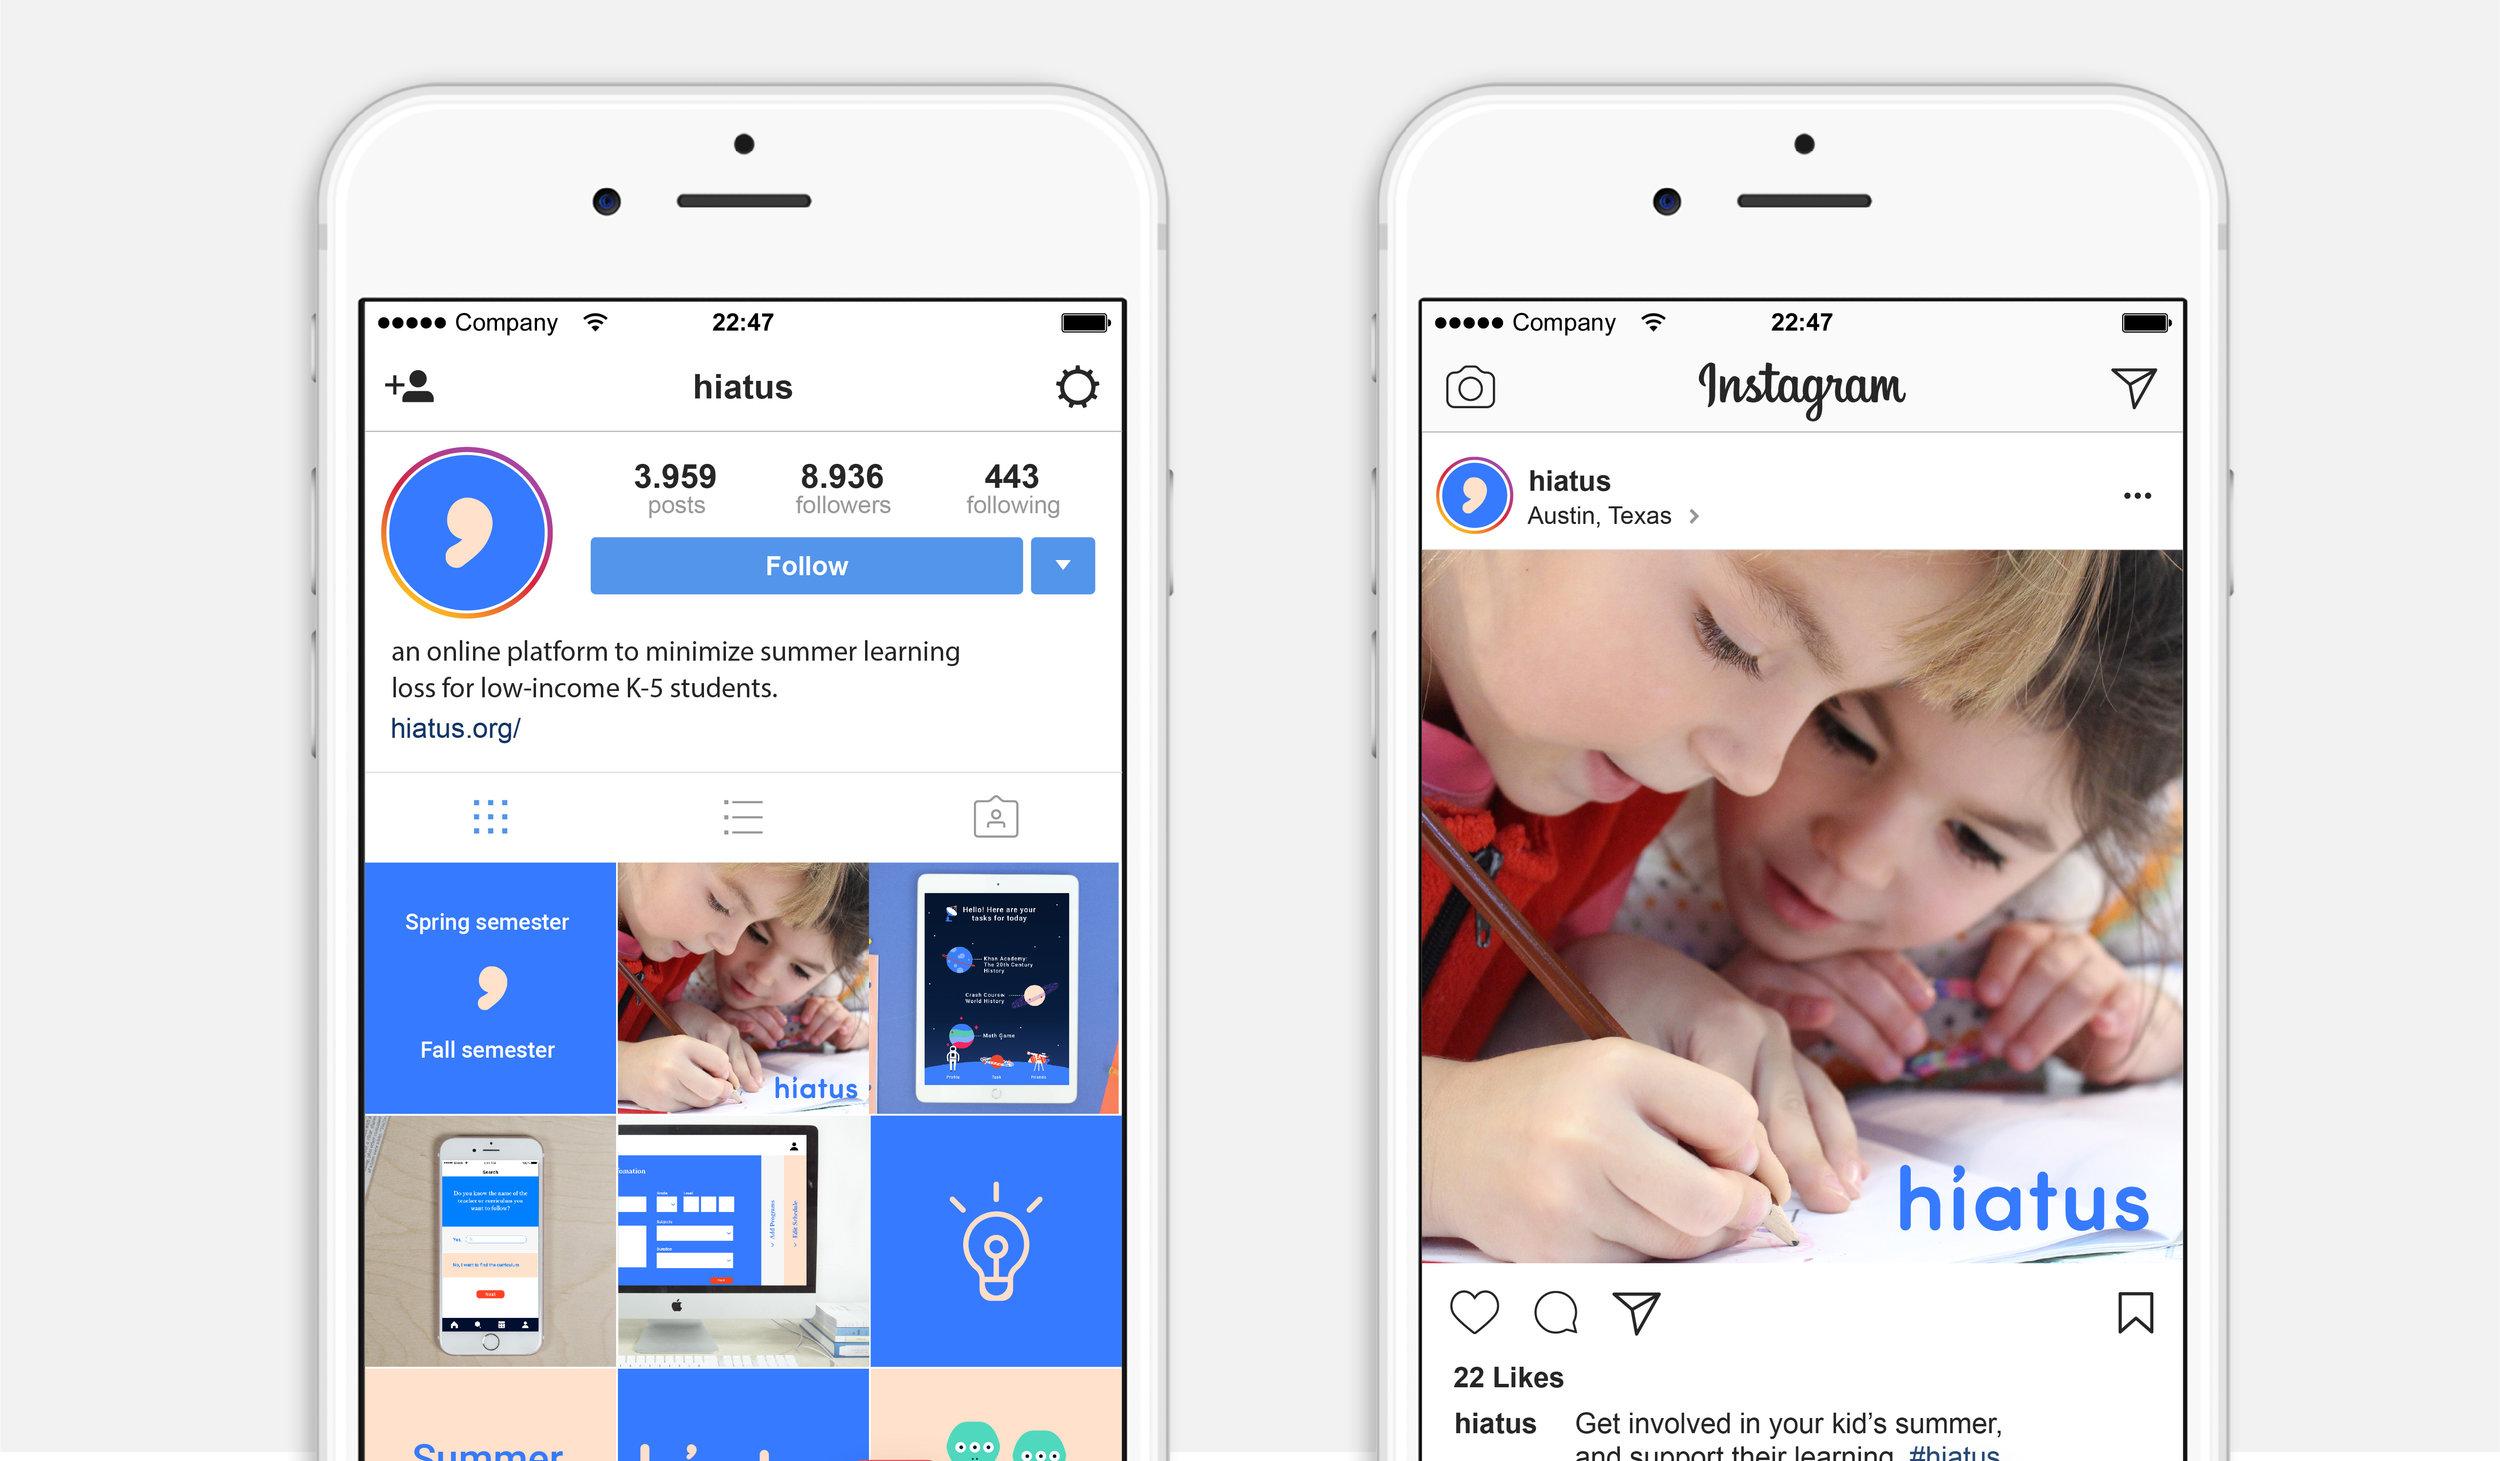 Instagram-Profile-2017-01.jpg